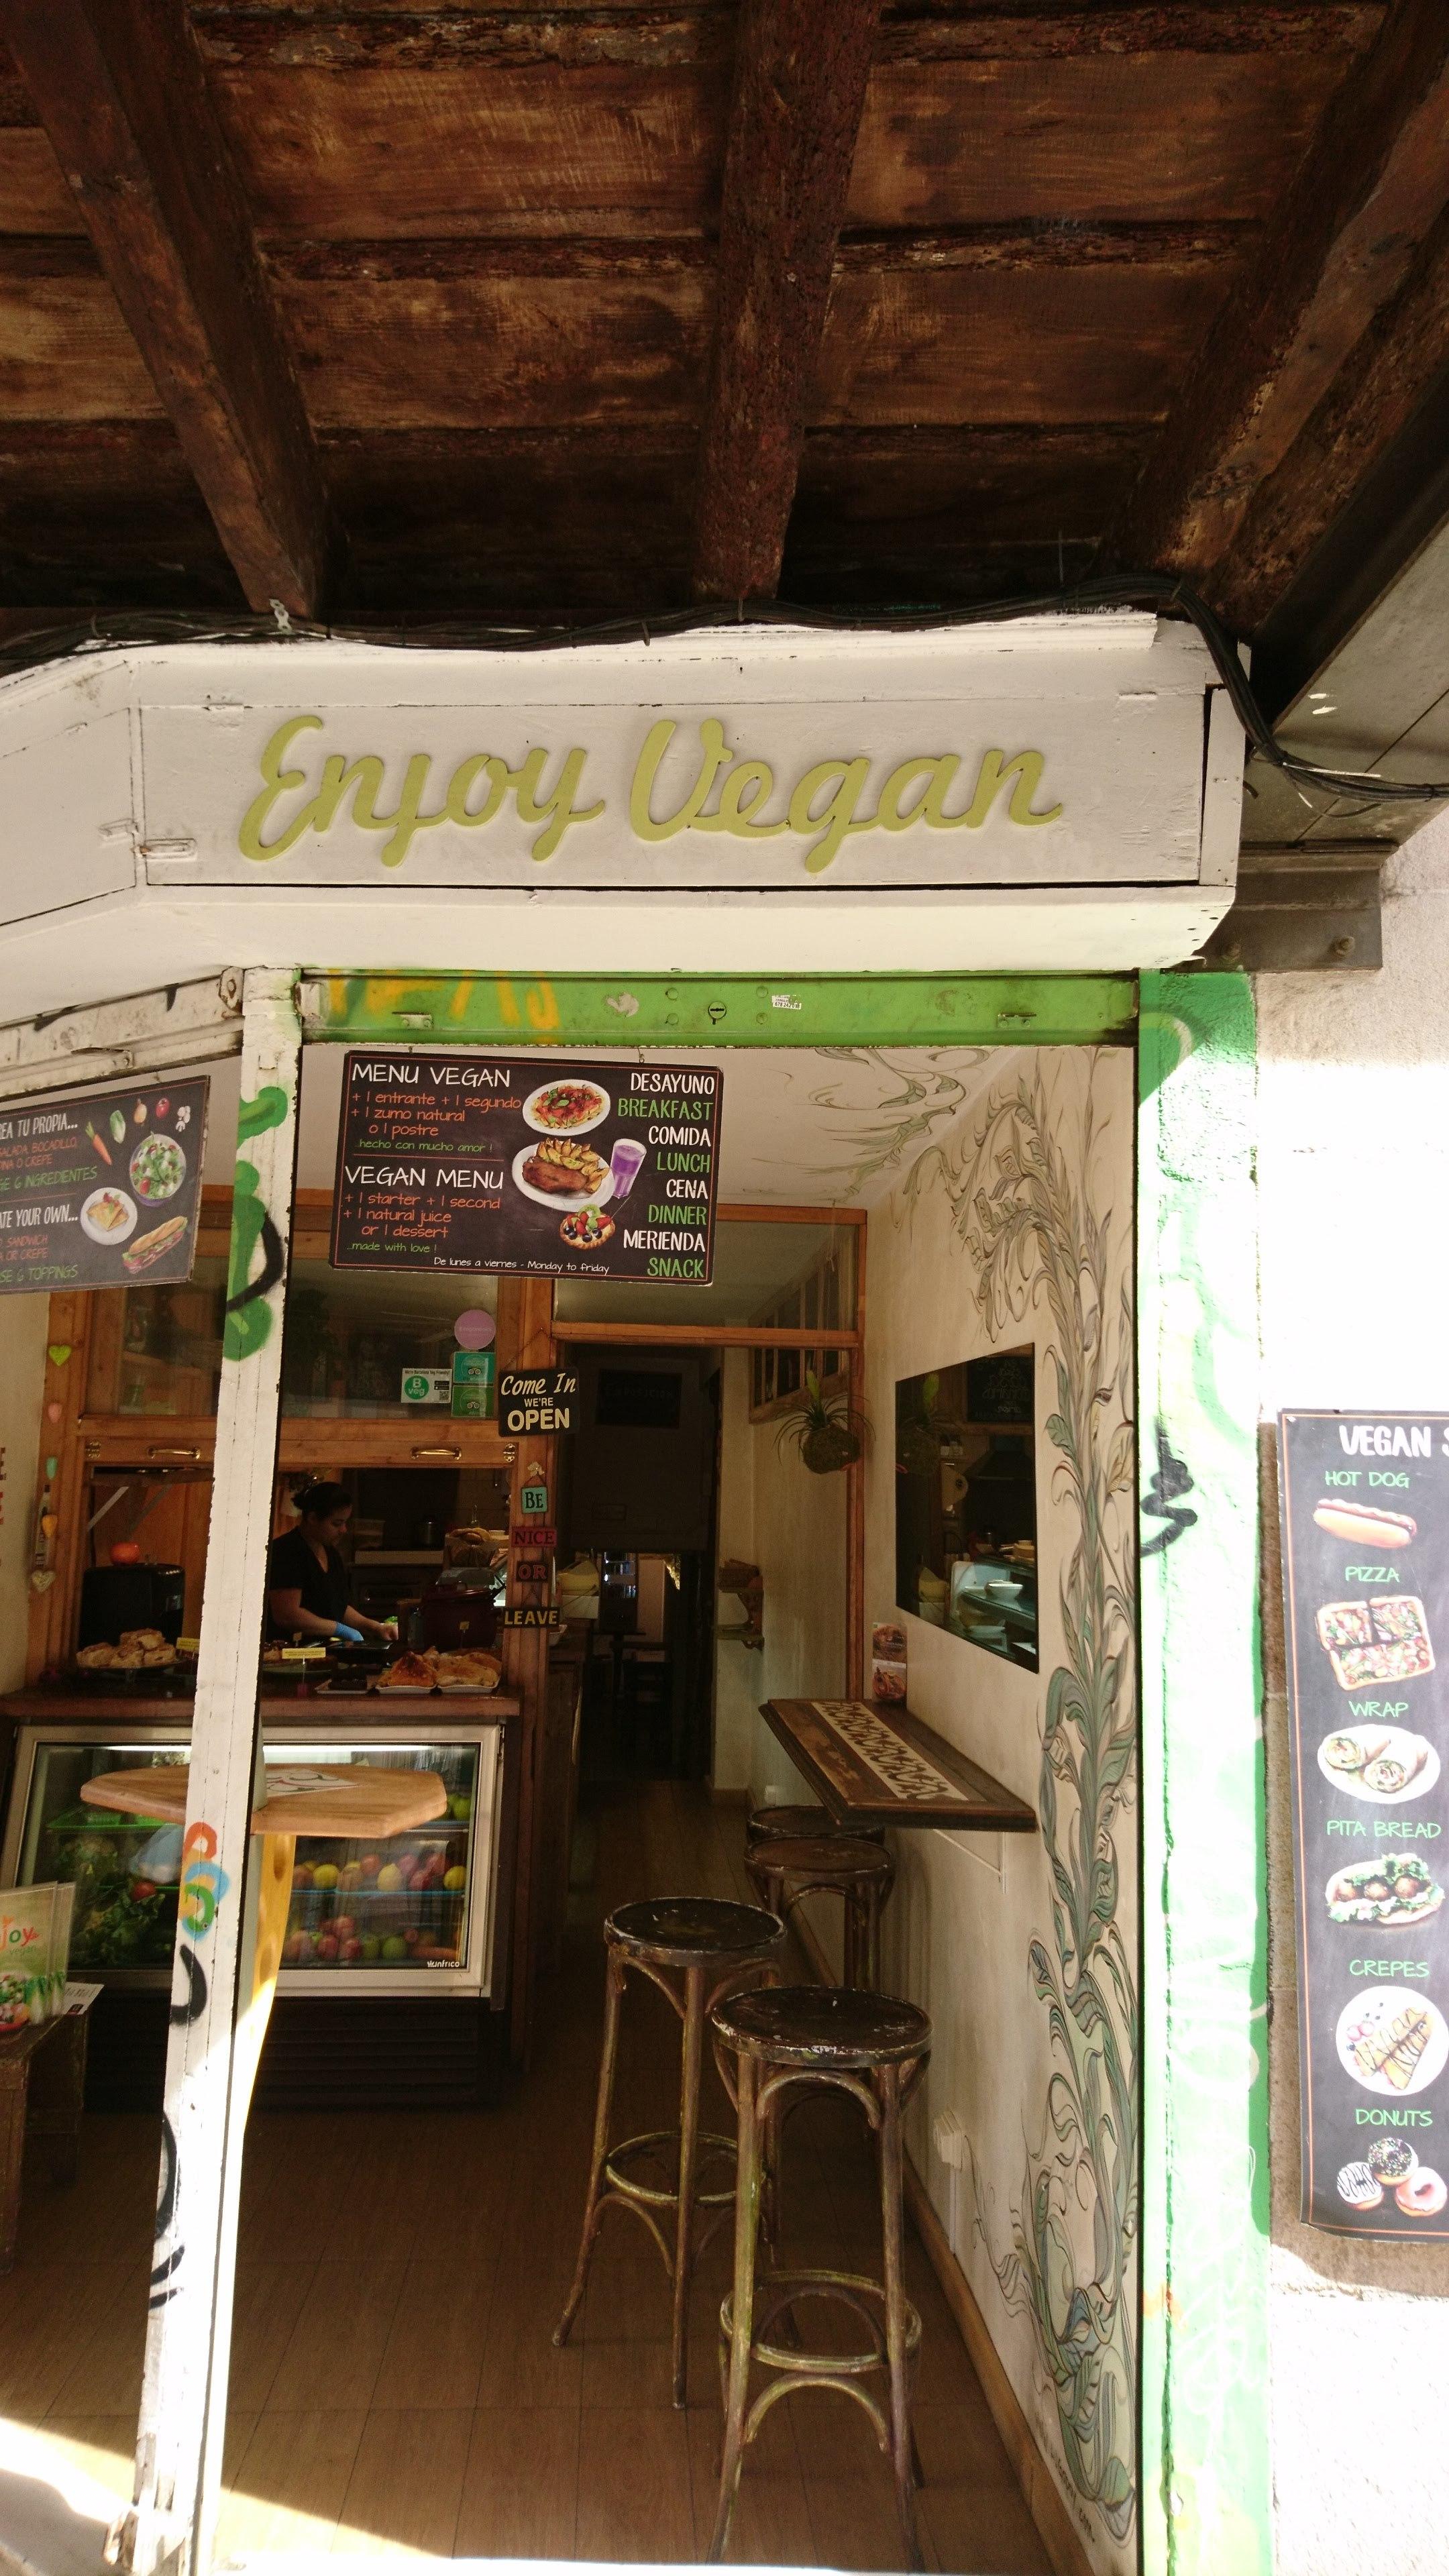 Enjoy Vegan Entrance